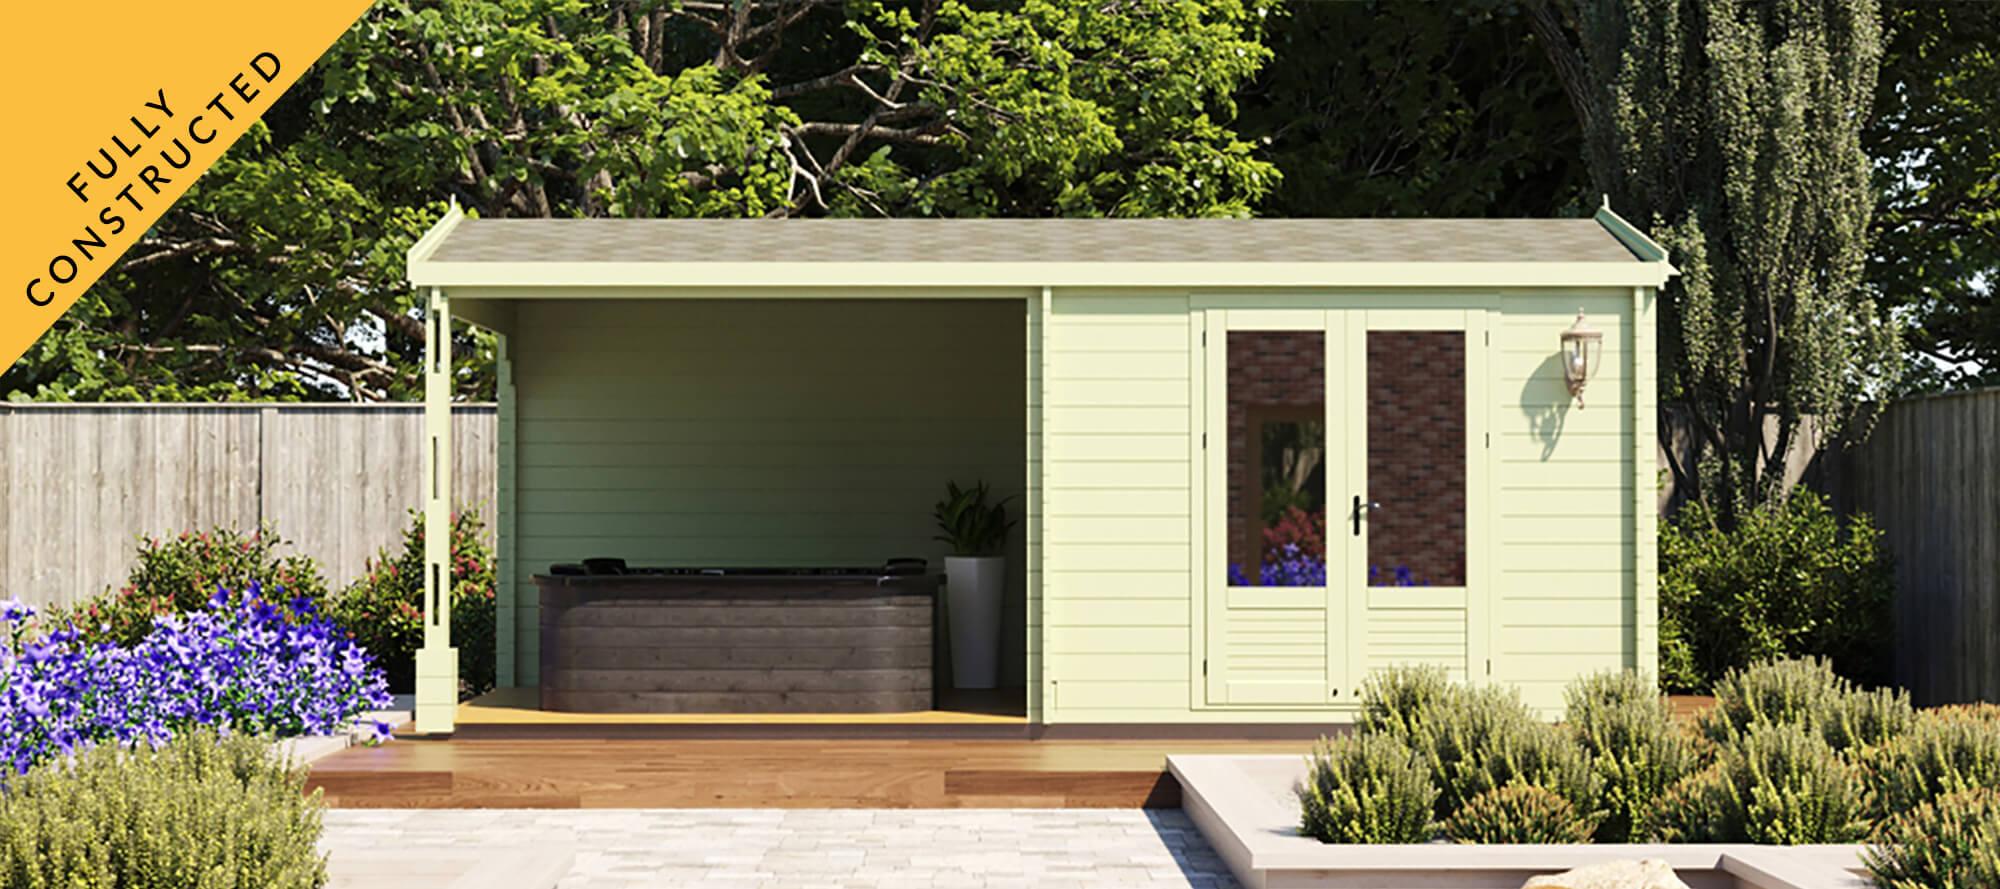 Garden building with outdoor area